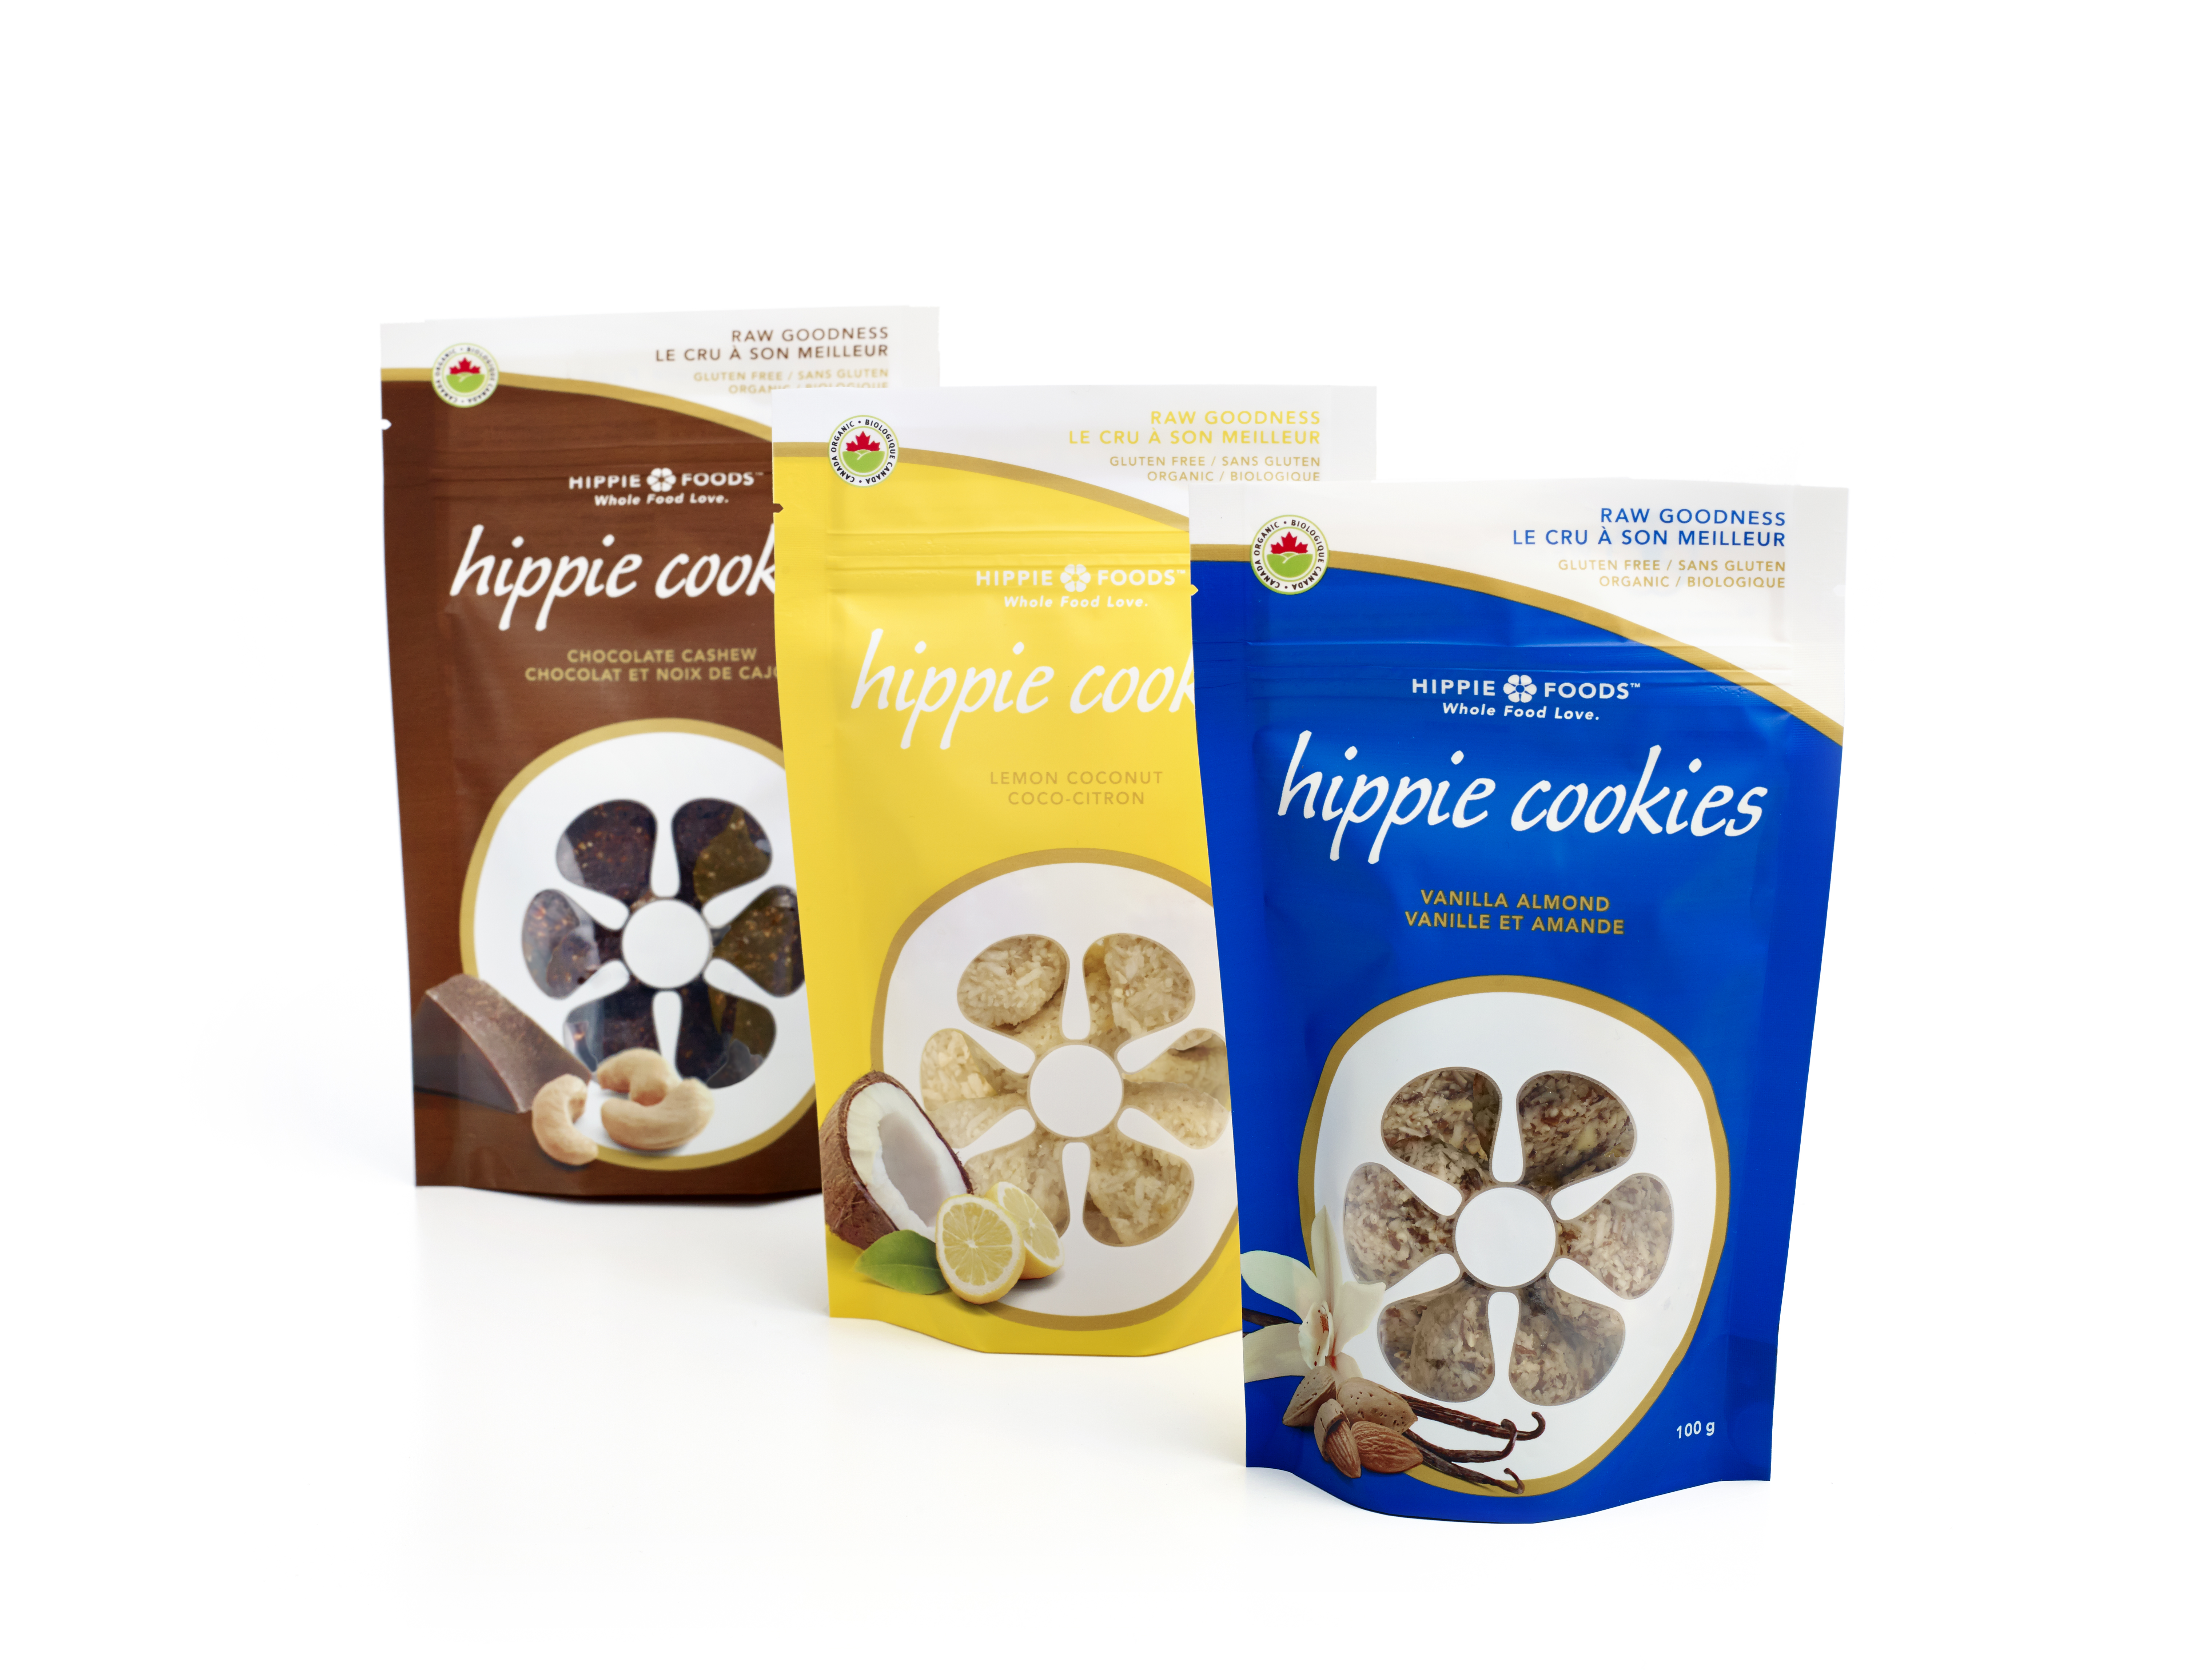 Hippie Cookies group